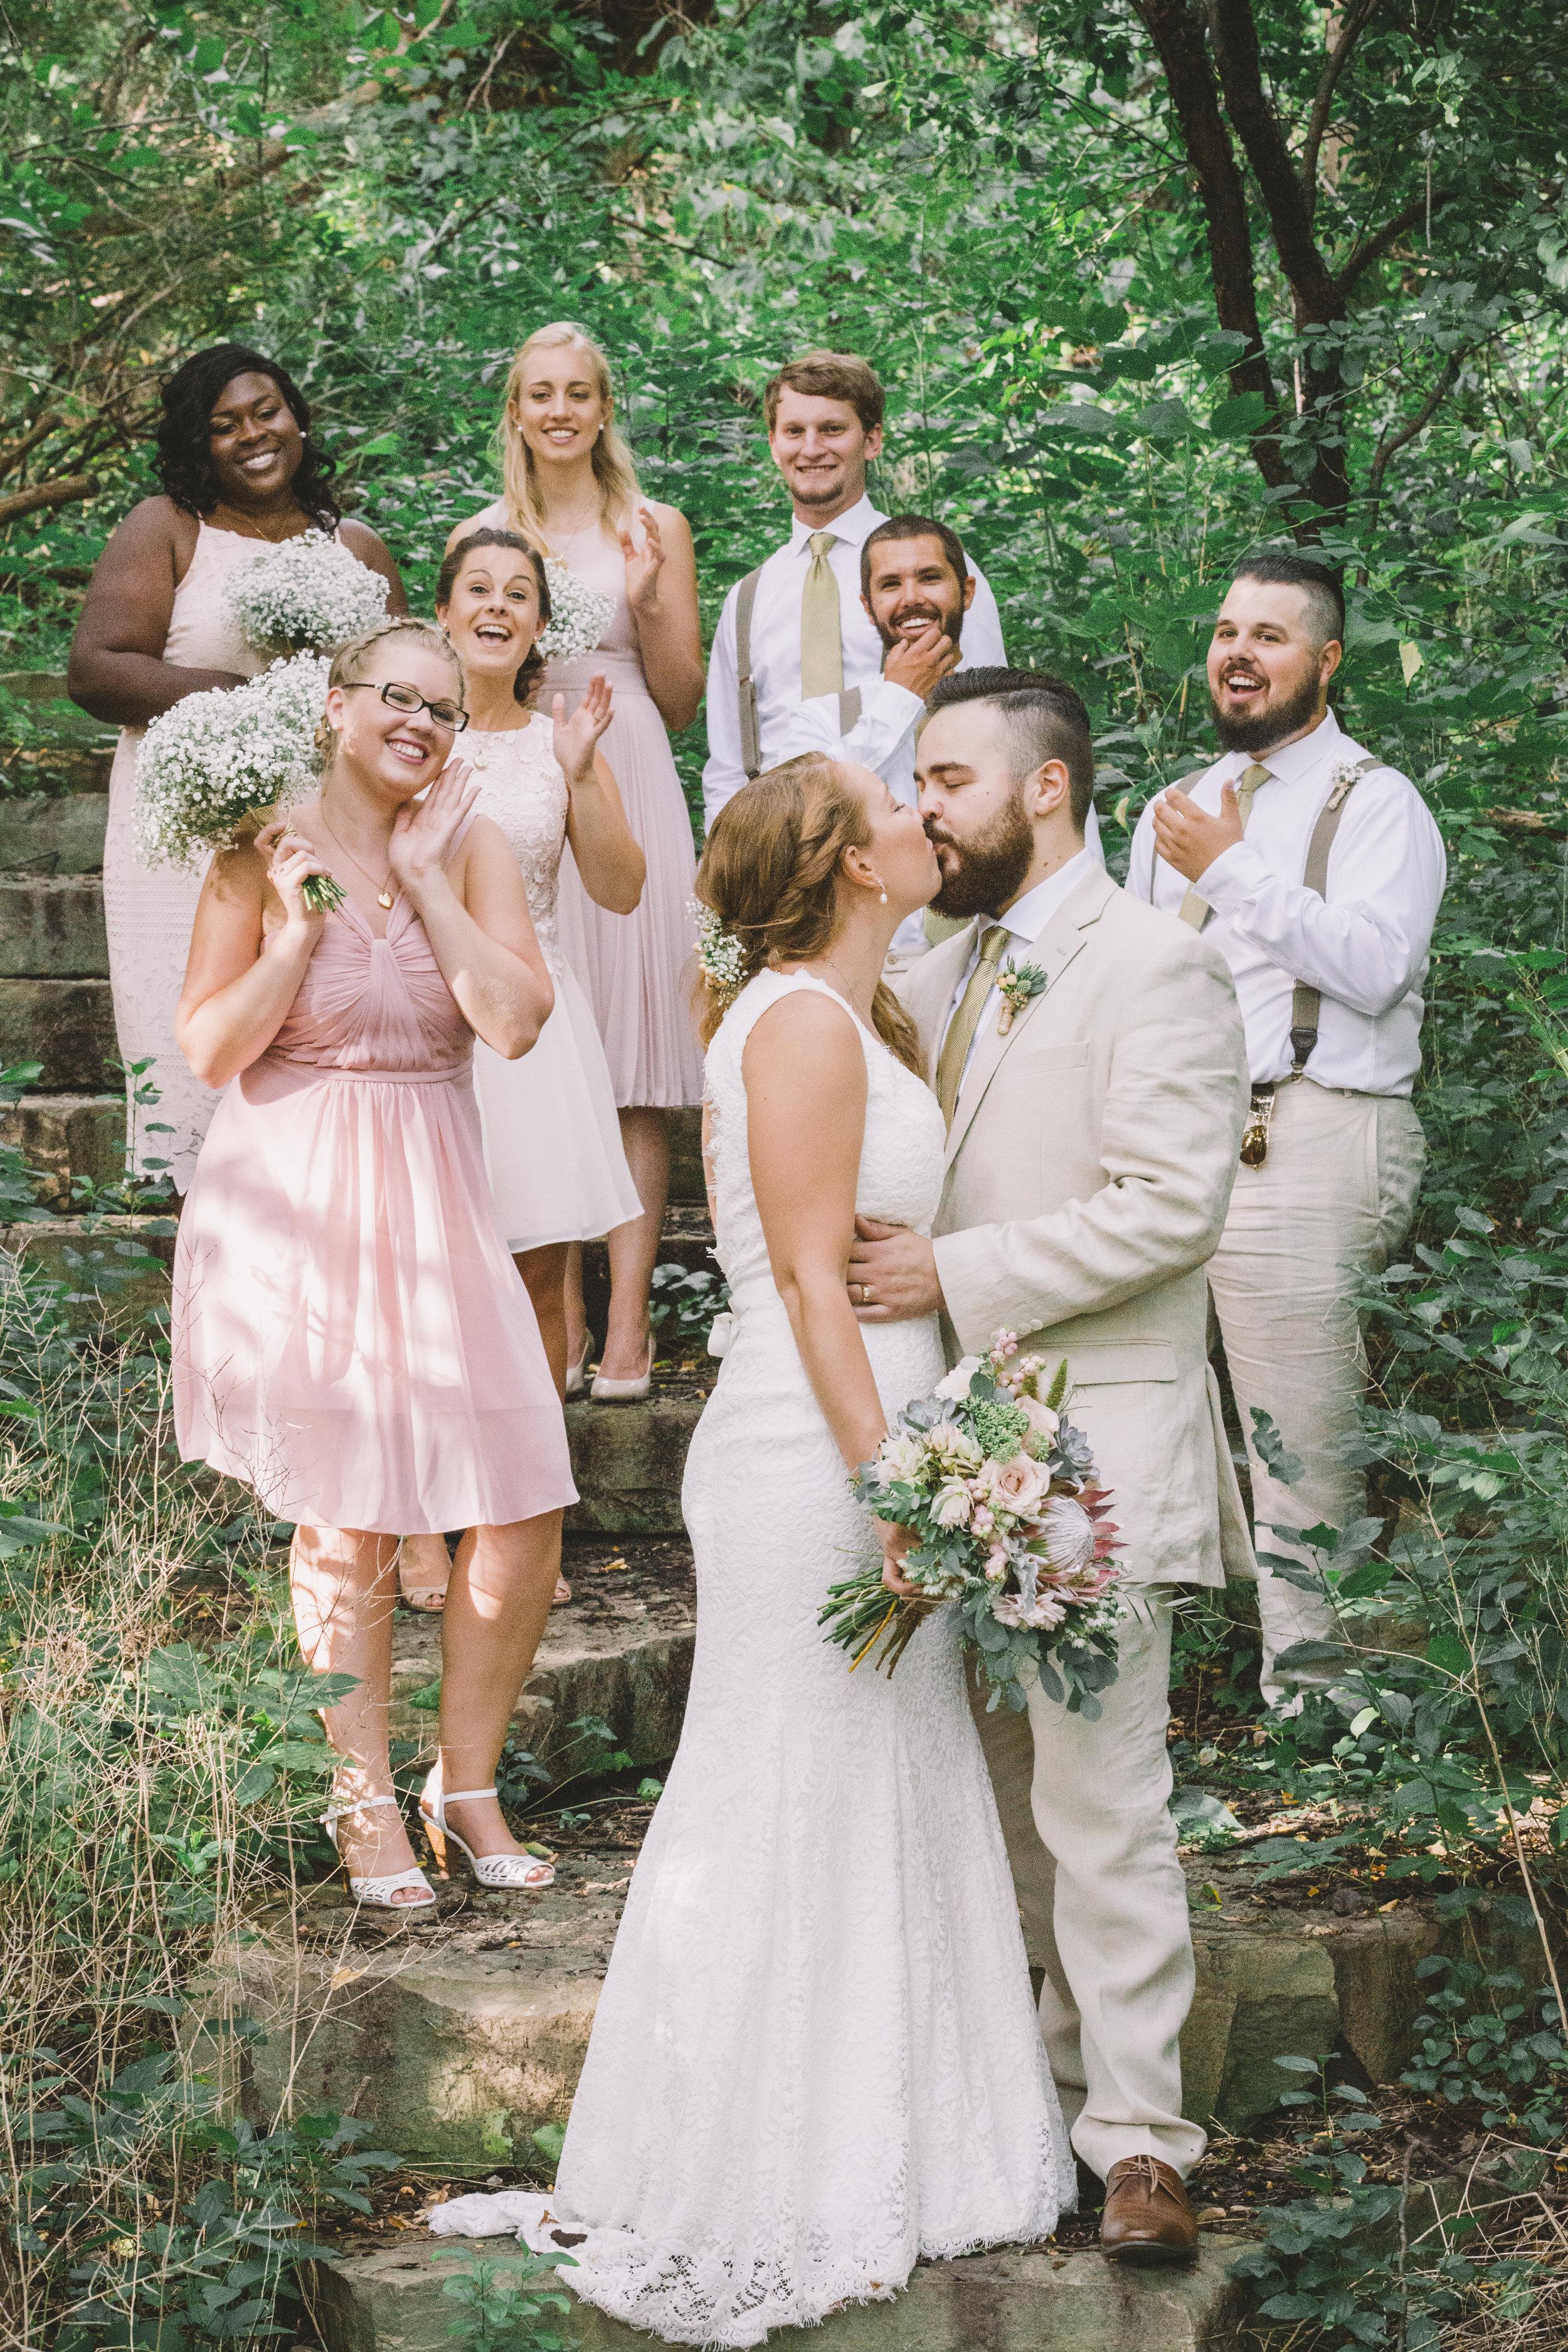 Wedding Part at Fantasy Farm in Toronto